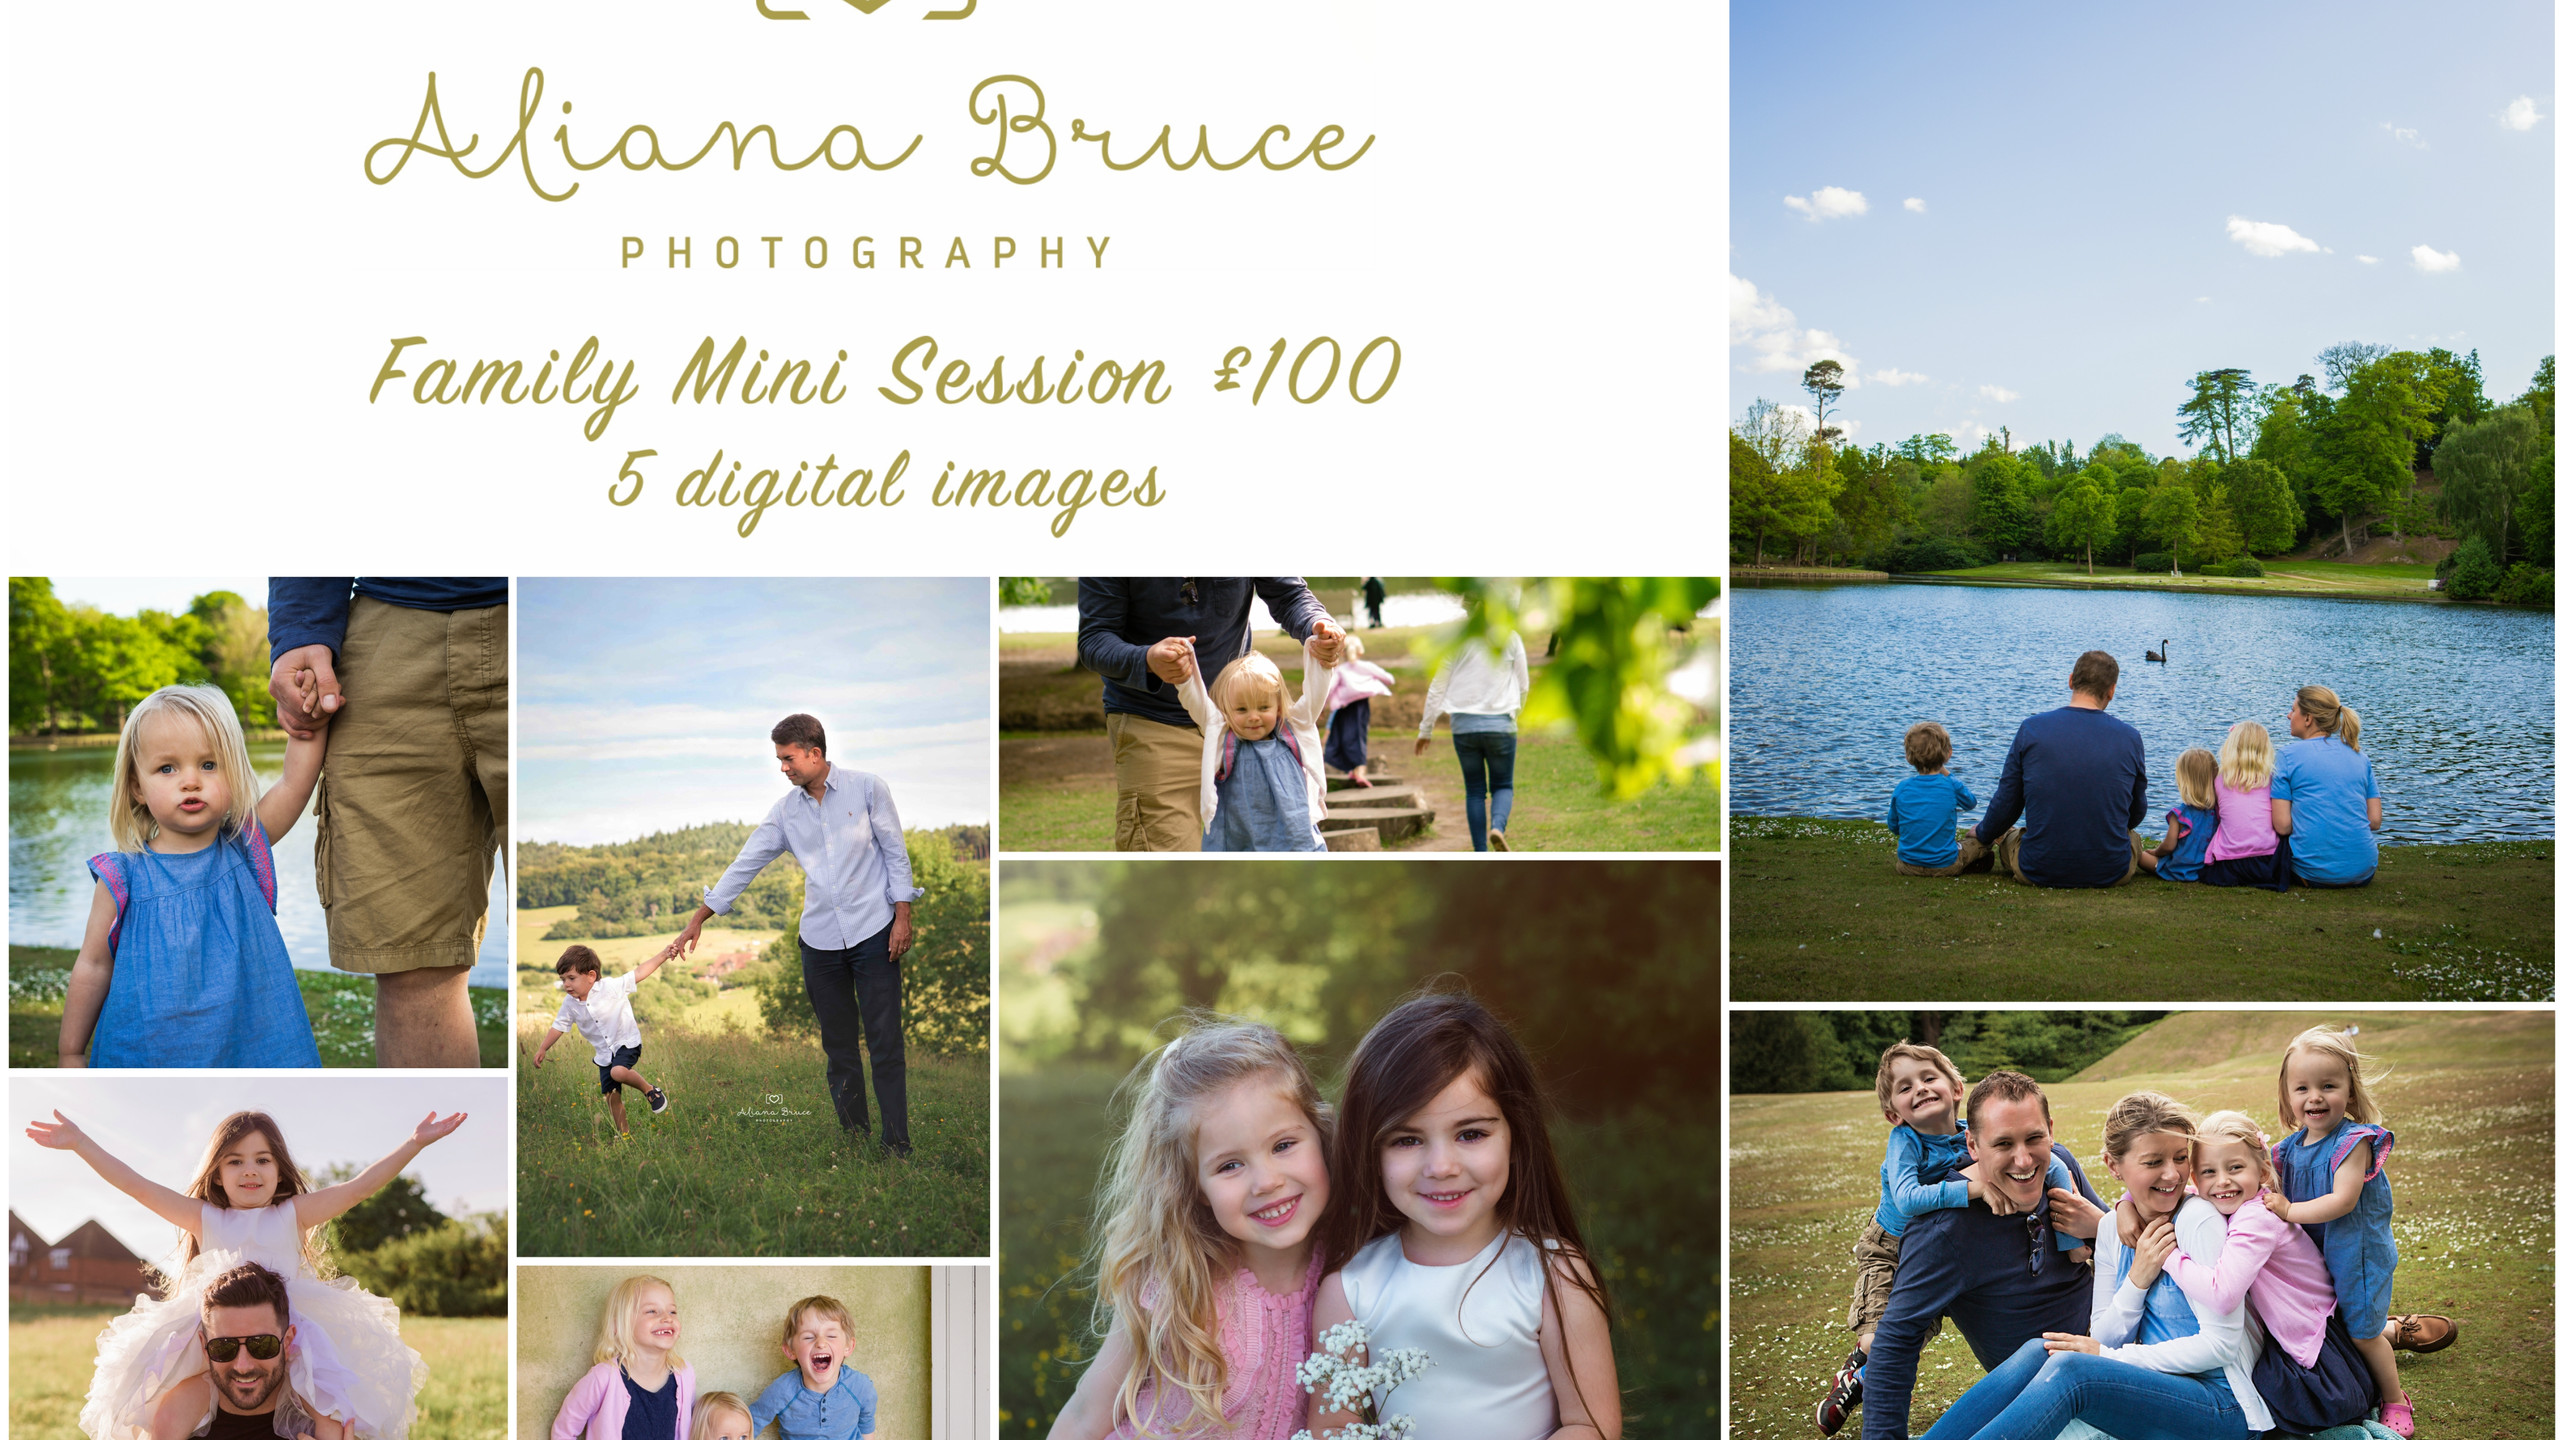 Family Mini Session Collage